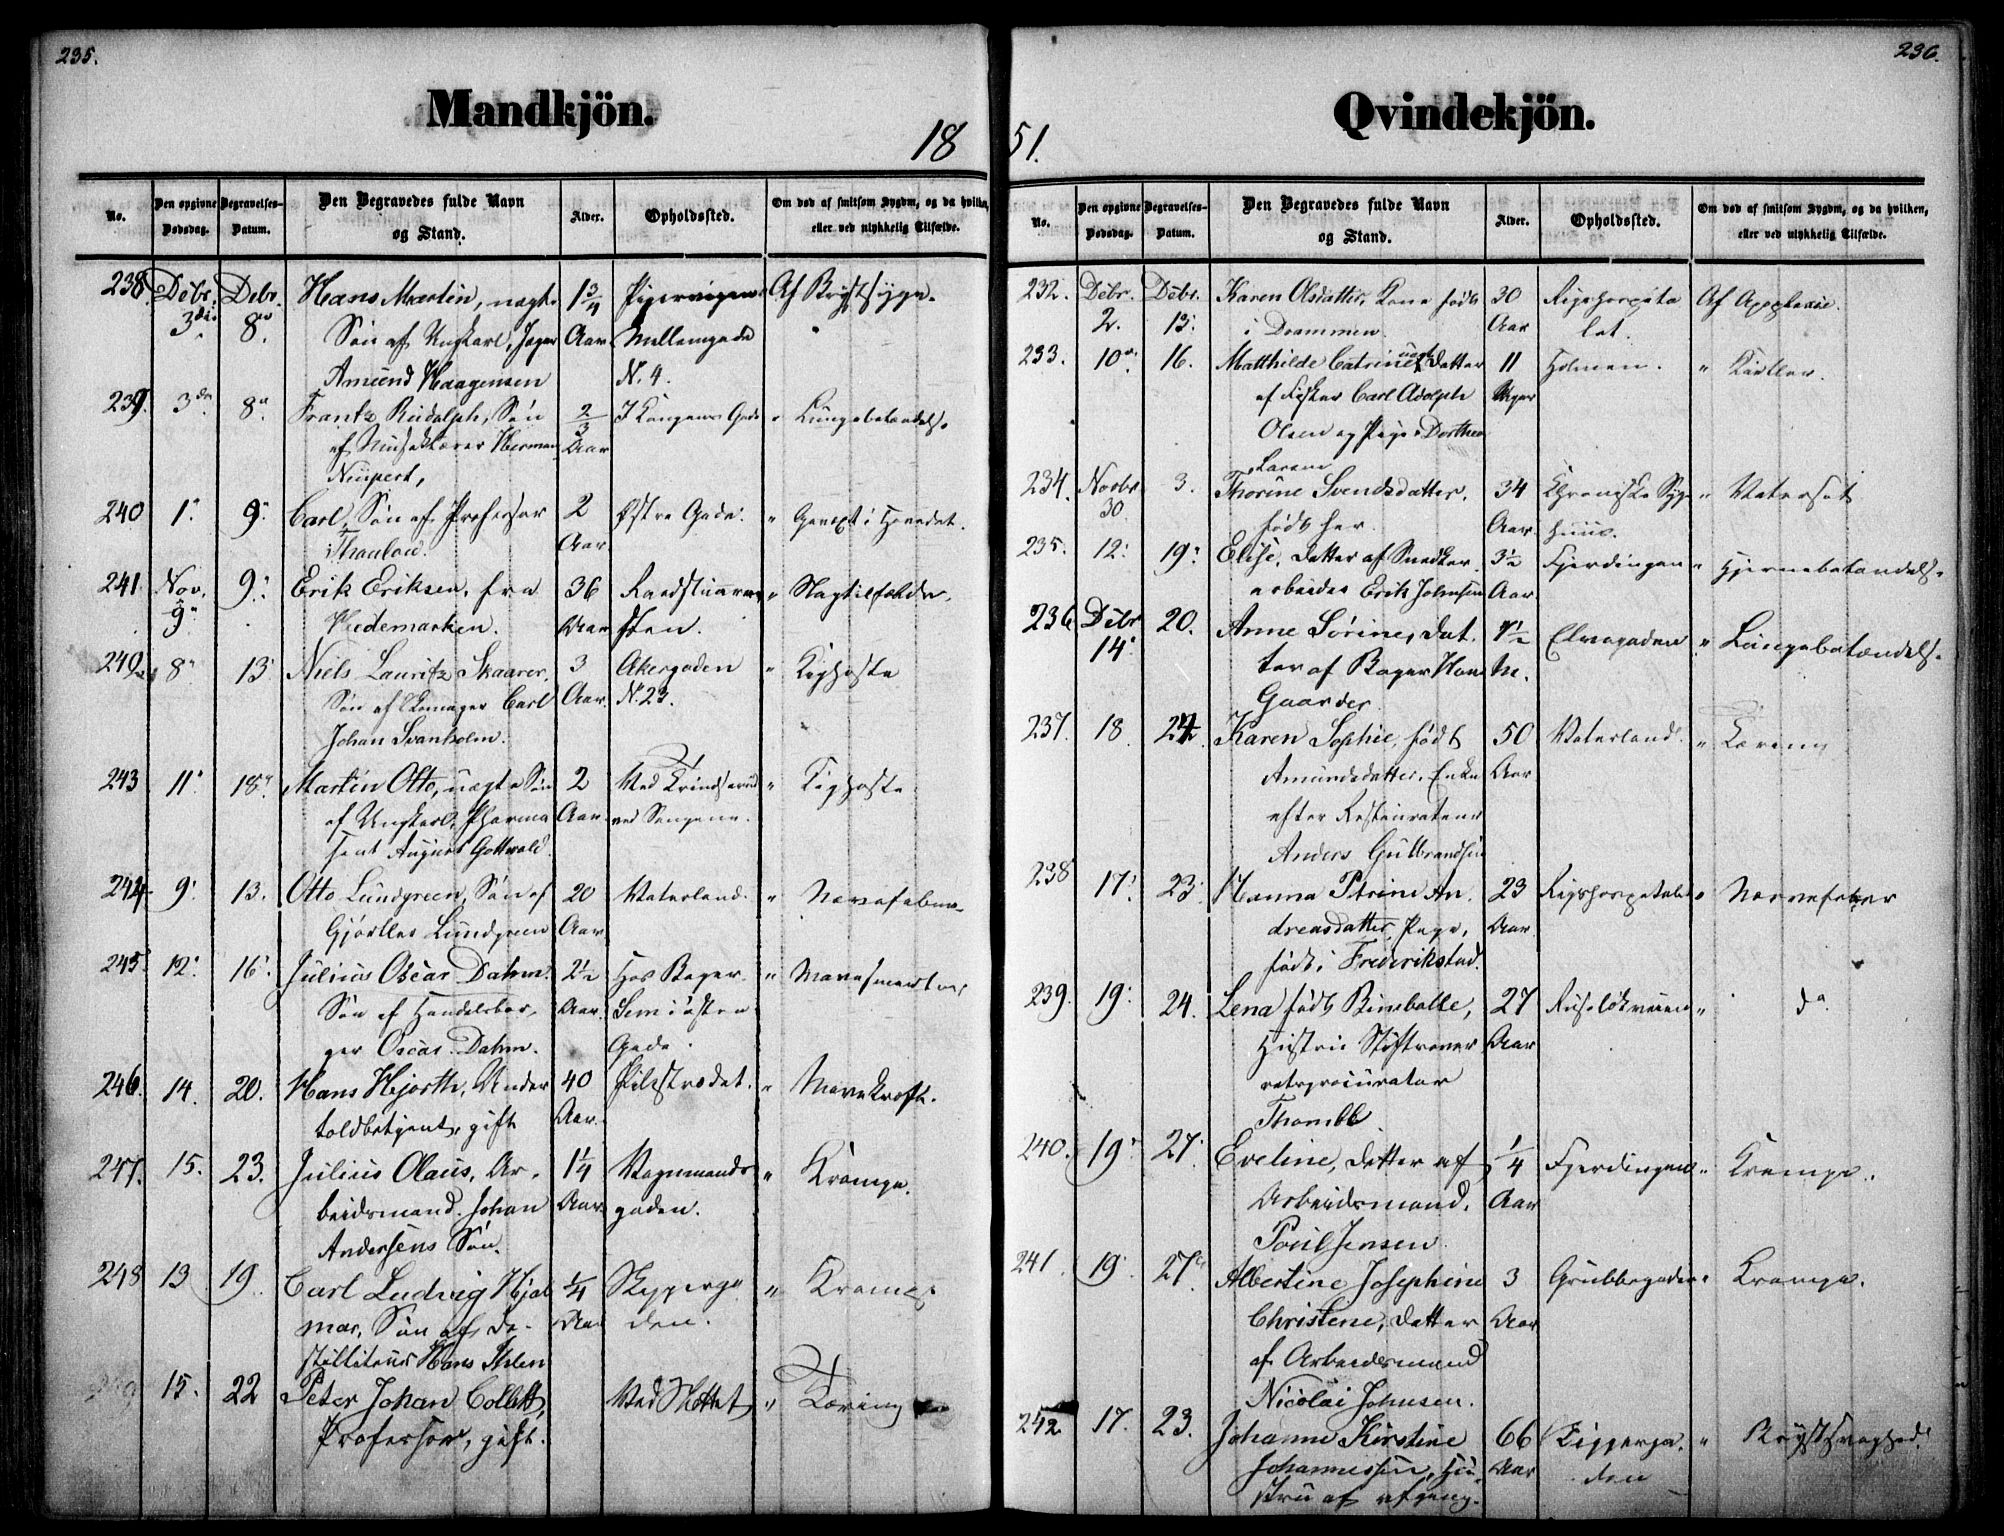 SAO, Oslo domkirke Kirkebøker, F/Fa/L0025: Parish register (official) no. 25, 1847-1867, p. 235-236